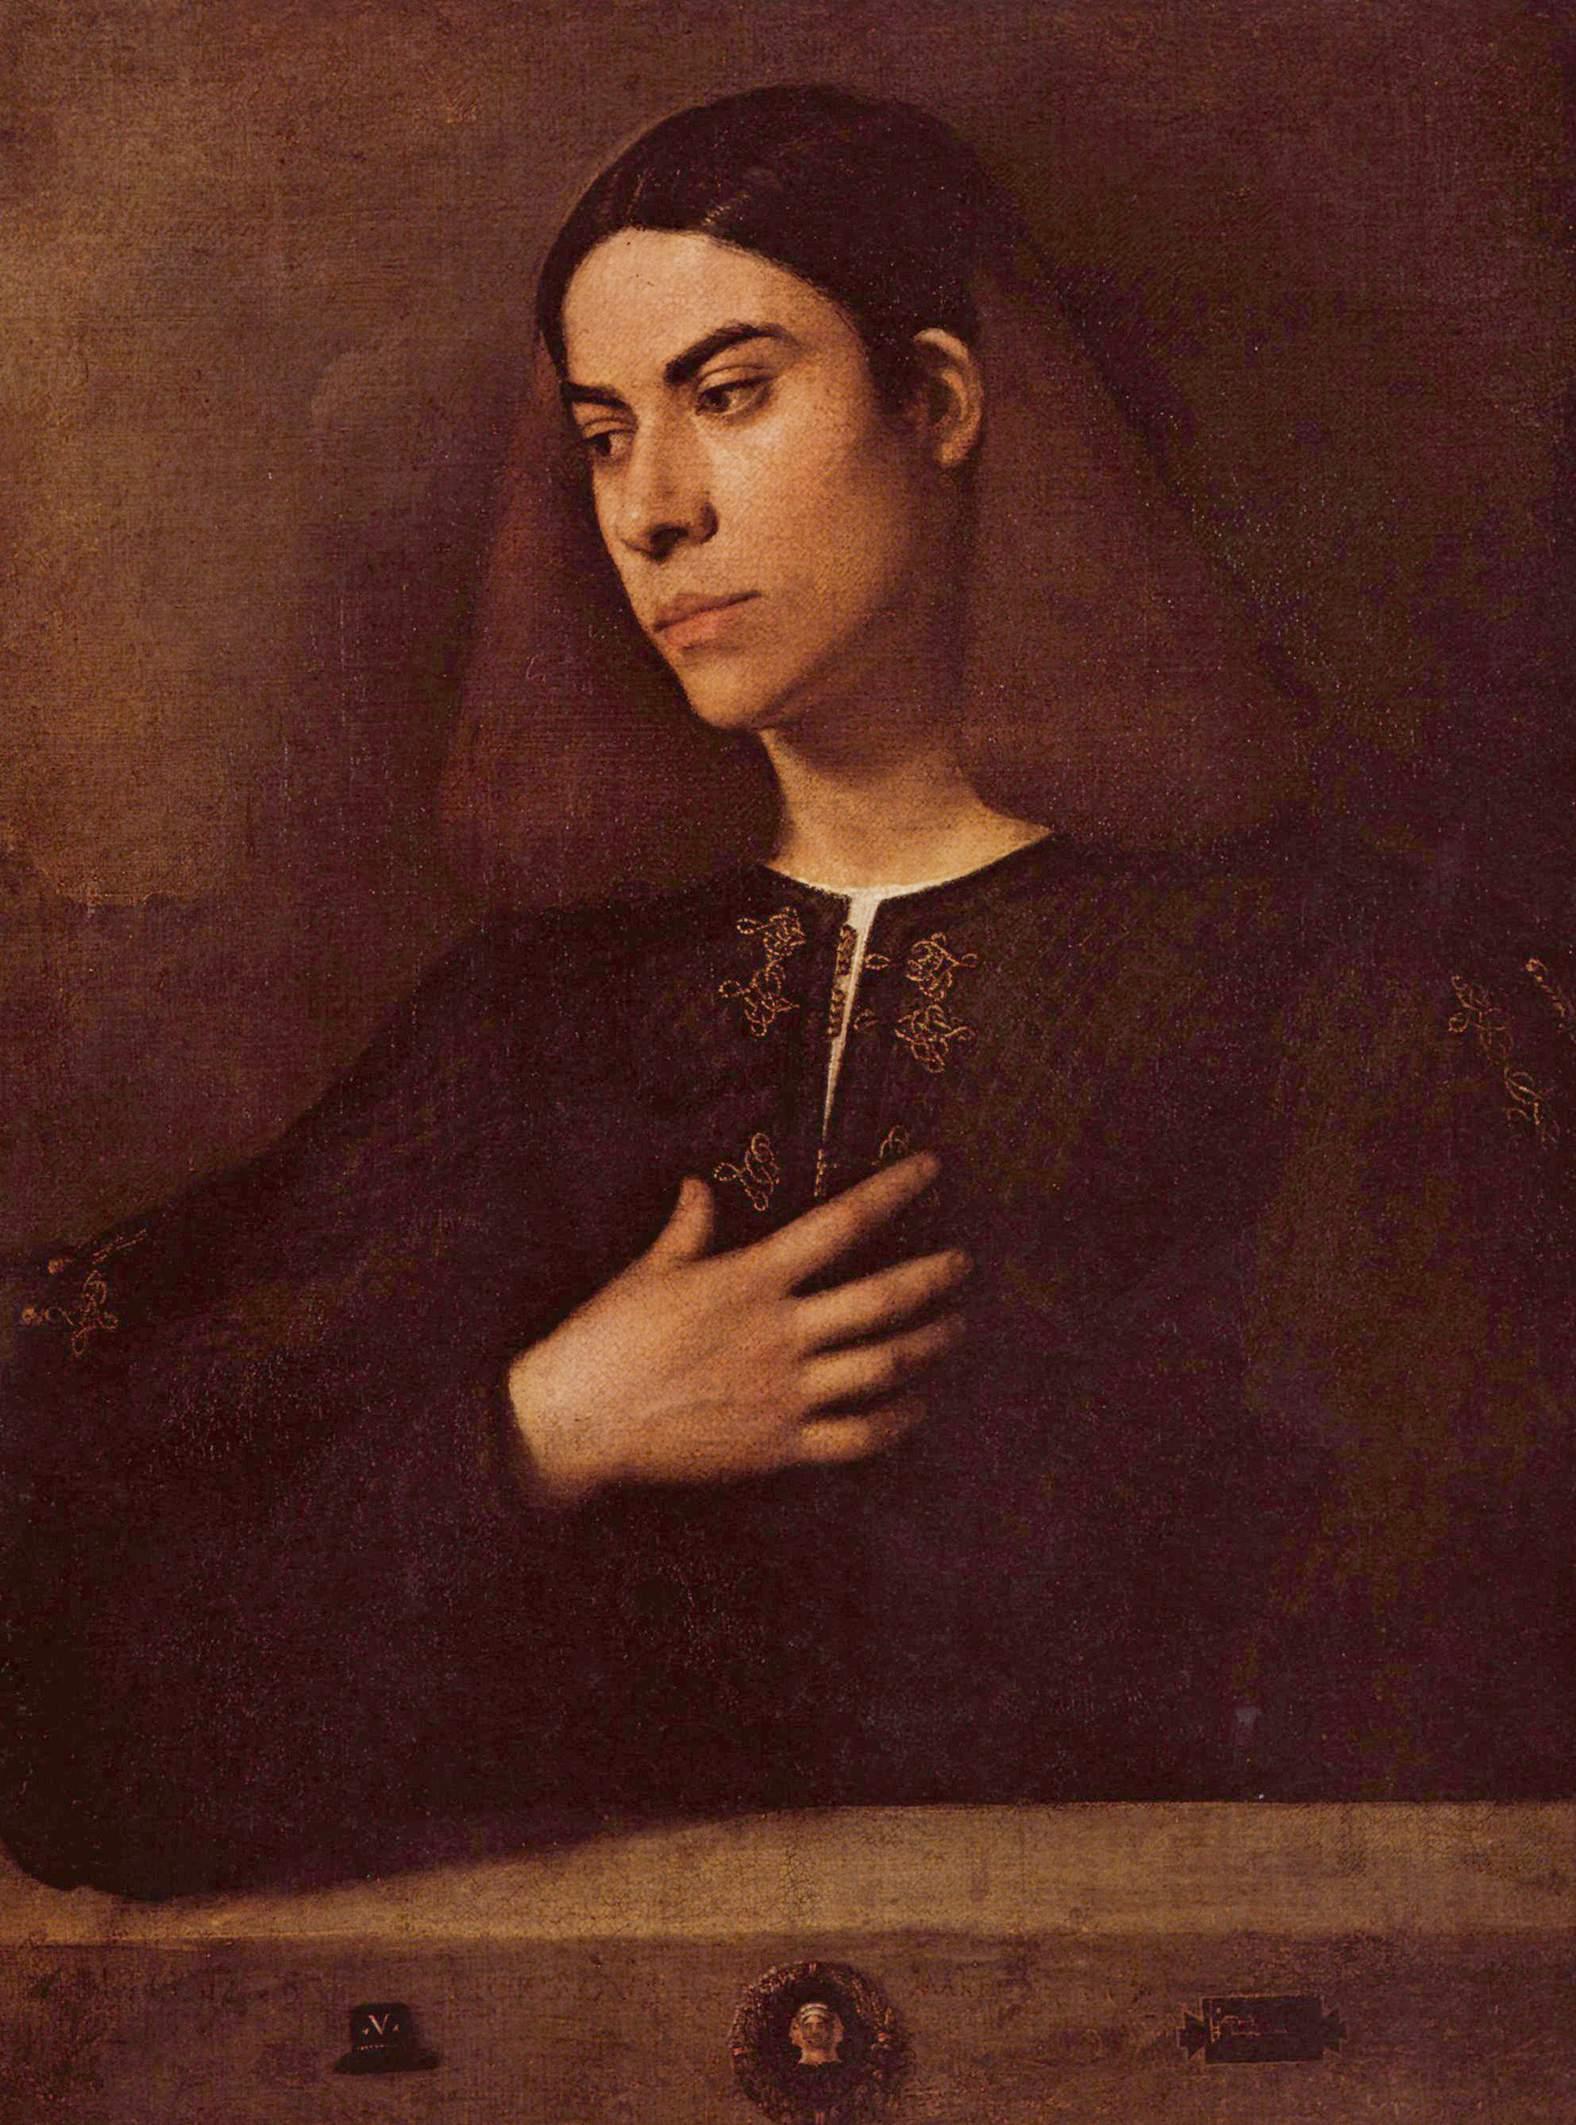 Портрет Антонио Броккардо, Джорджоне